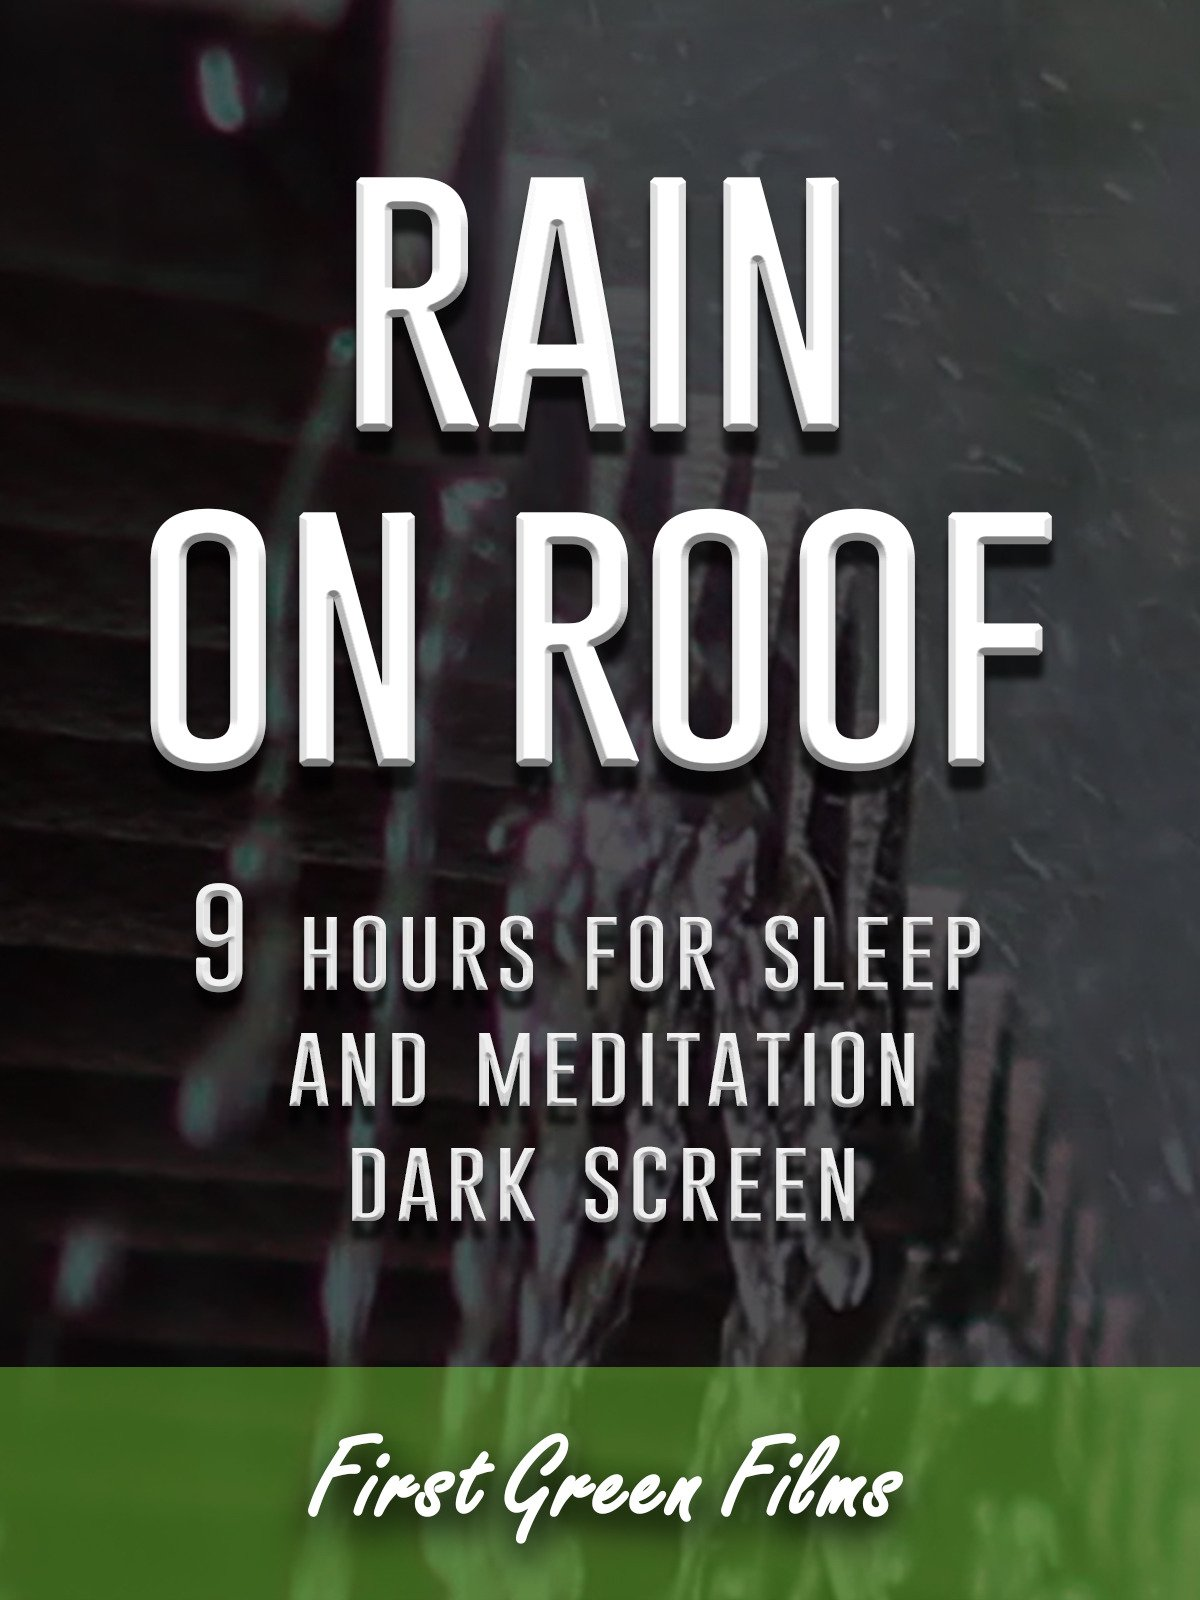 Rain on roof, 9 hours for Sleep and Meditation, dark screen